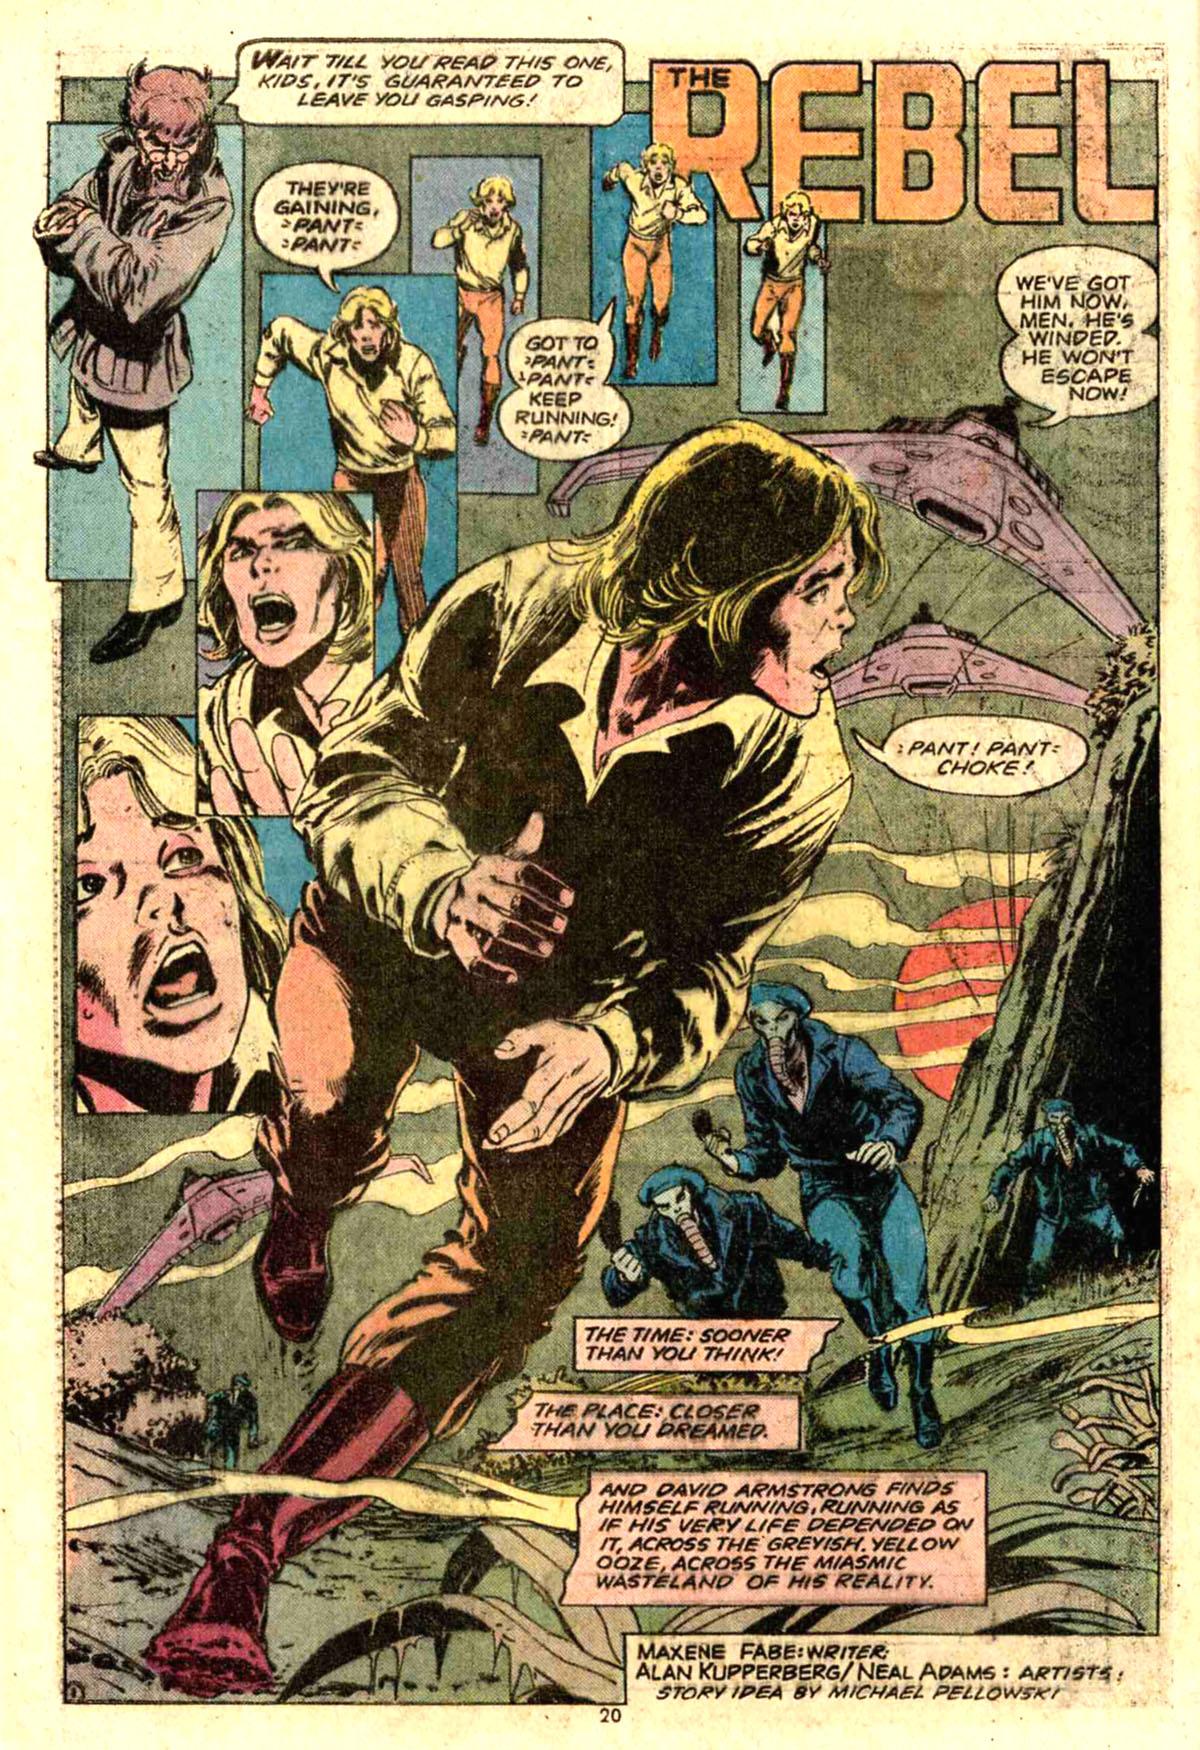 House of Mystery (1951) #228 pg.20, Art by Alan Kupperberg & Neal Adams.